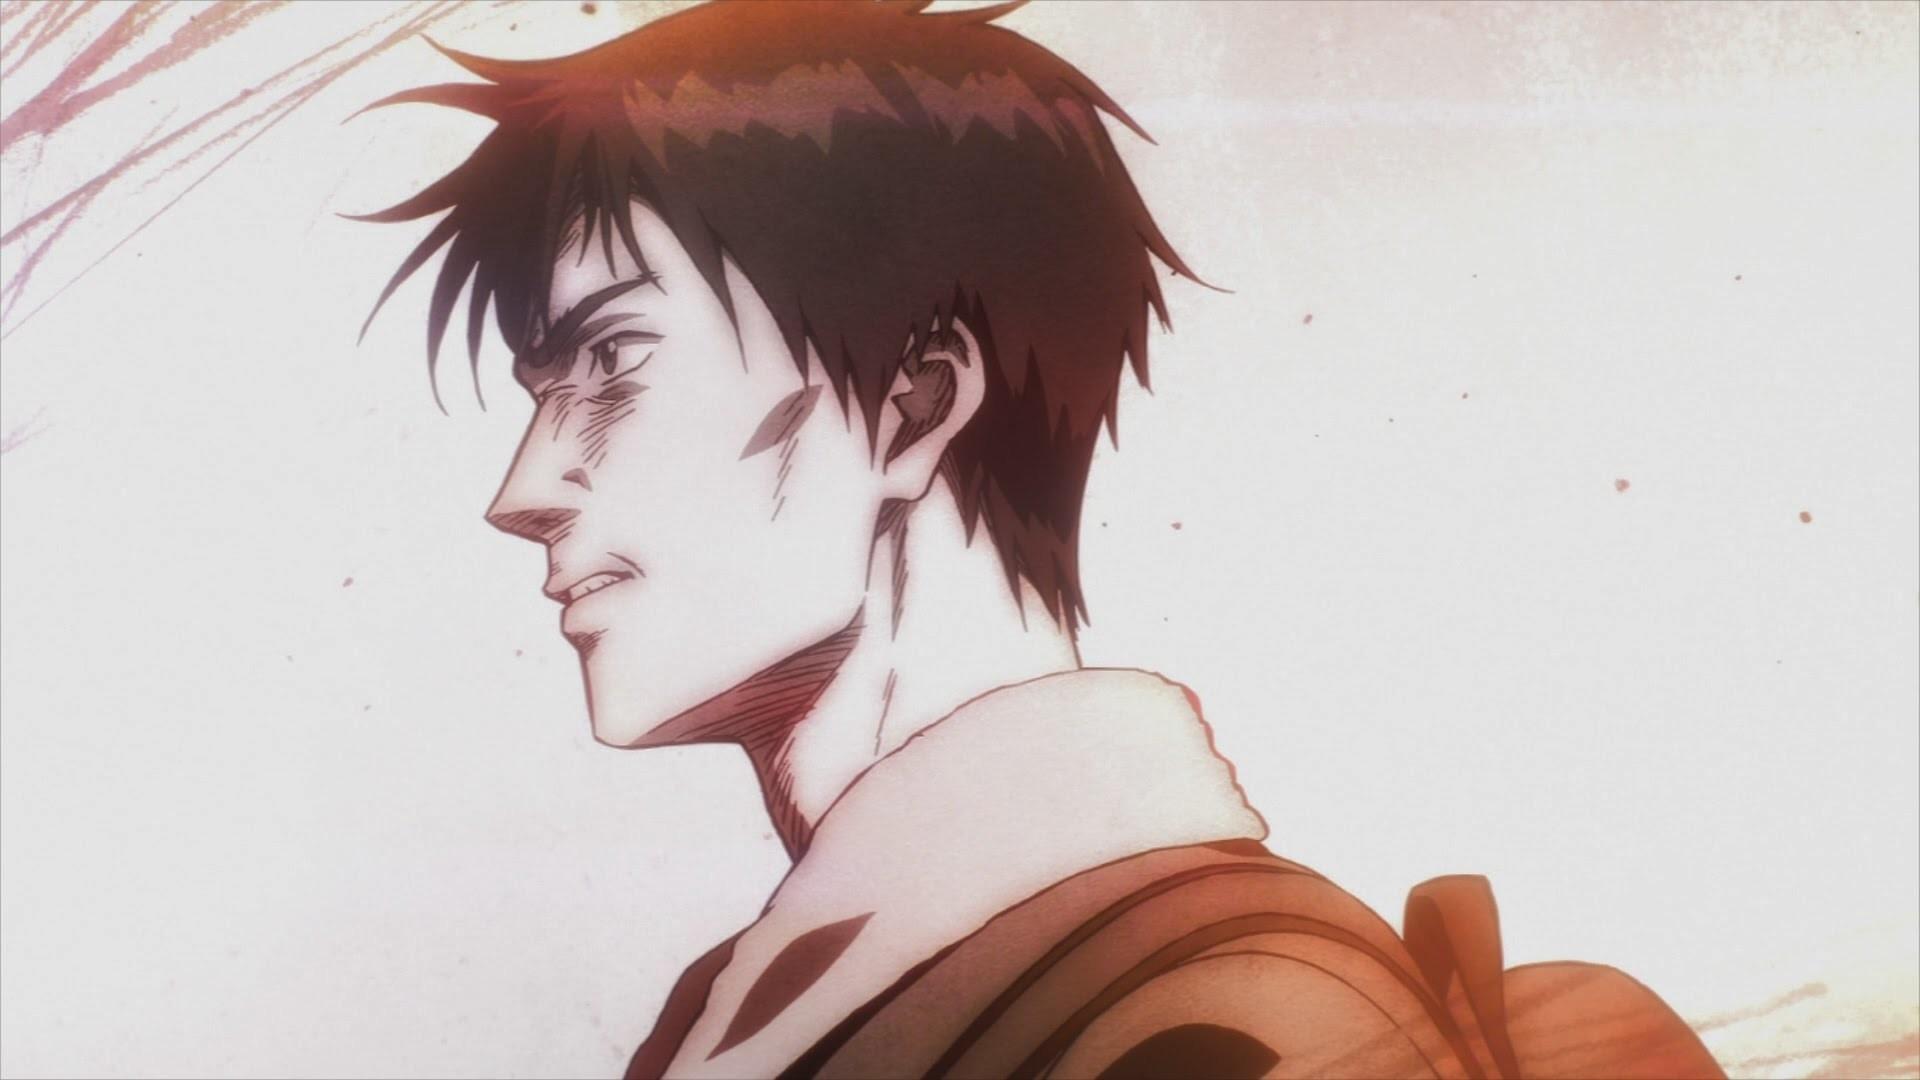 Parasyte The Maxim Episode 6 寄生獣 セイの格率 Review – Shinichi's Transformation